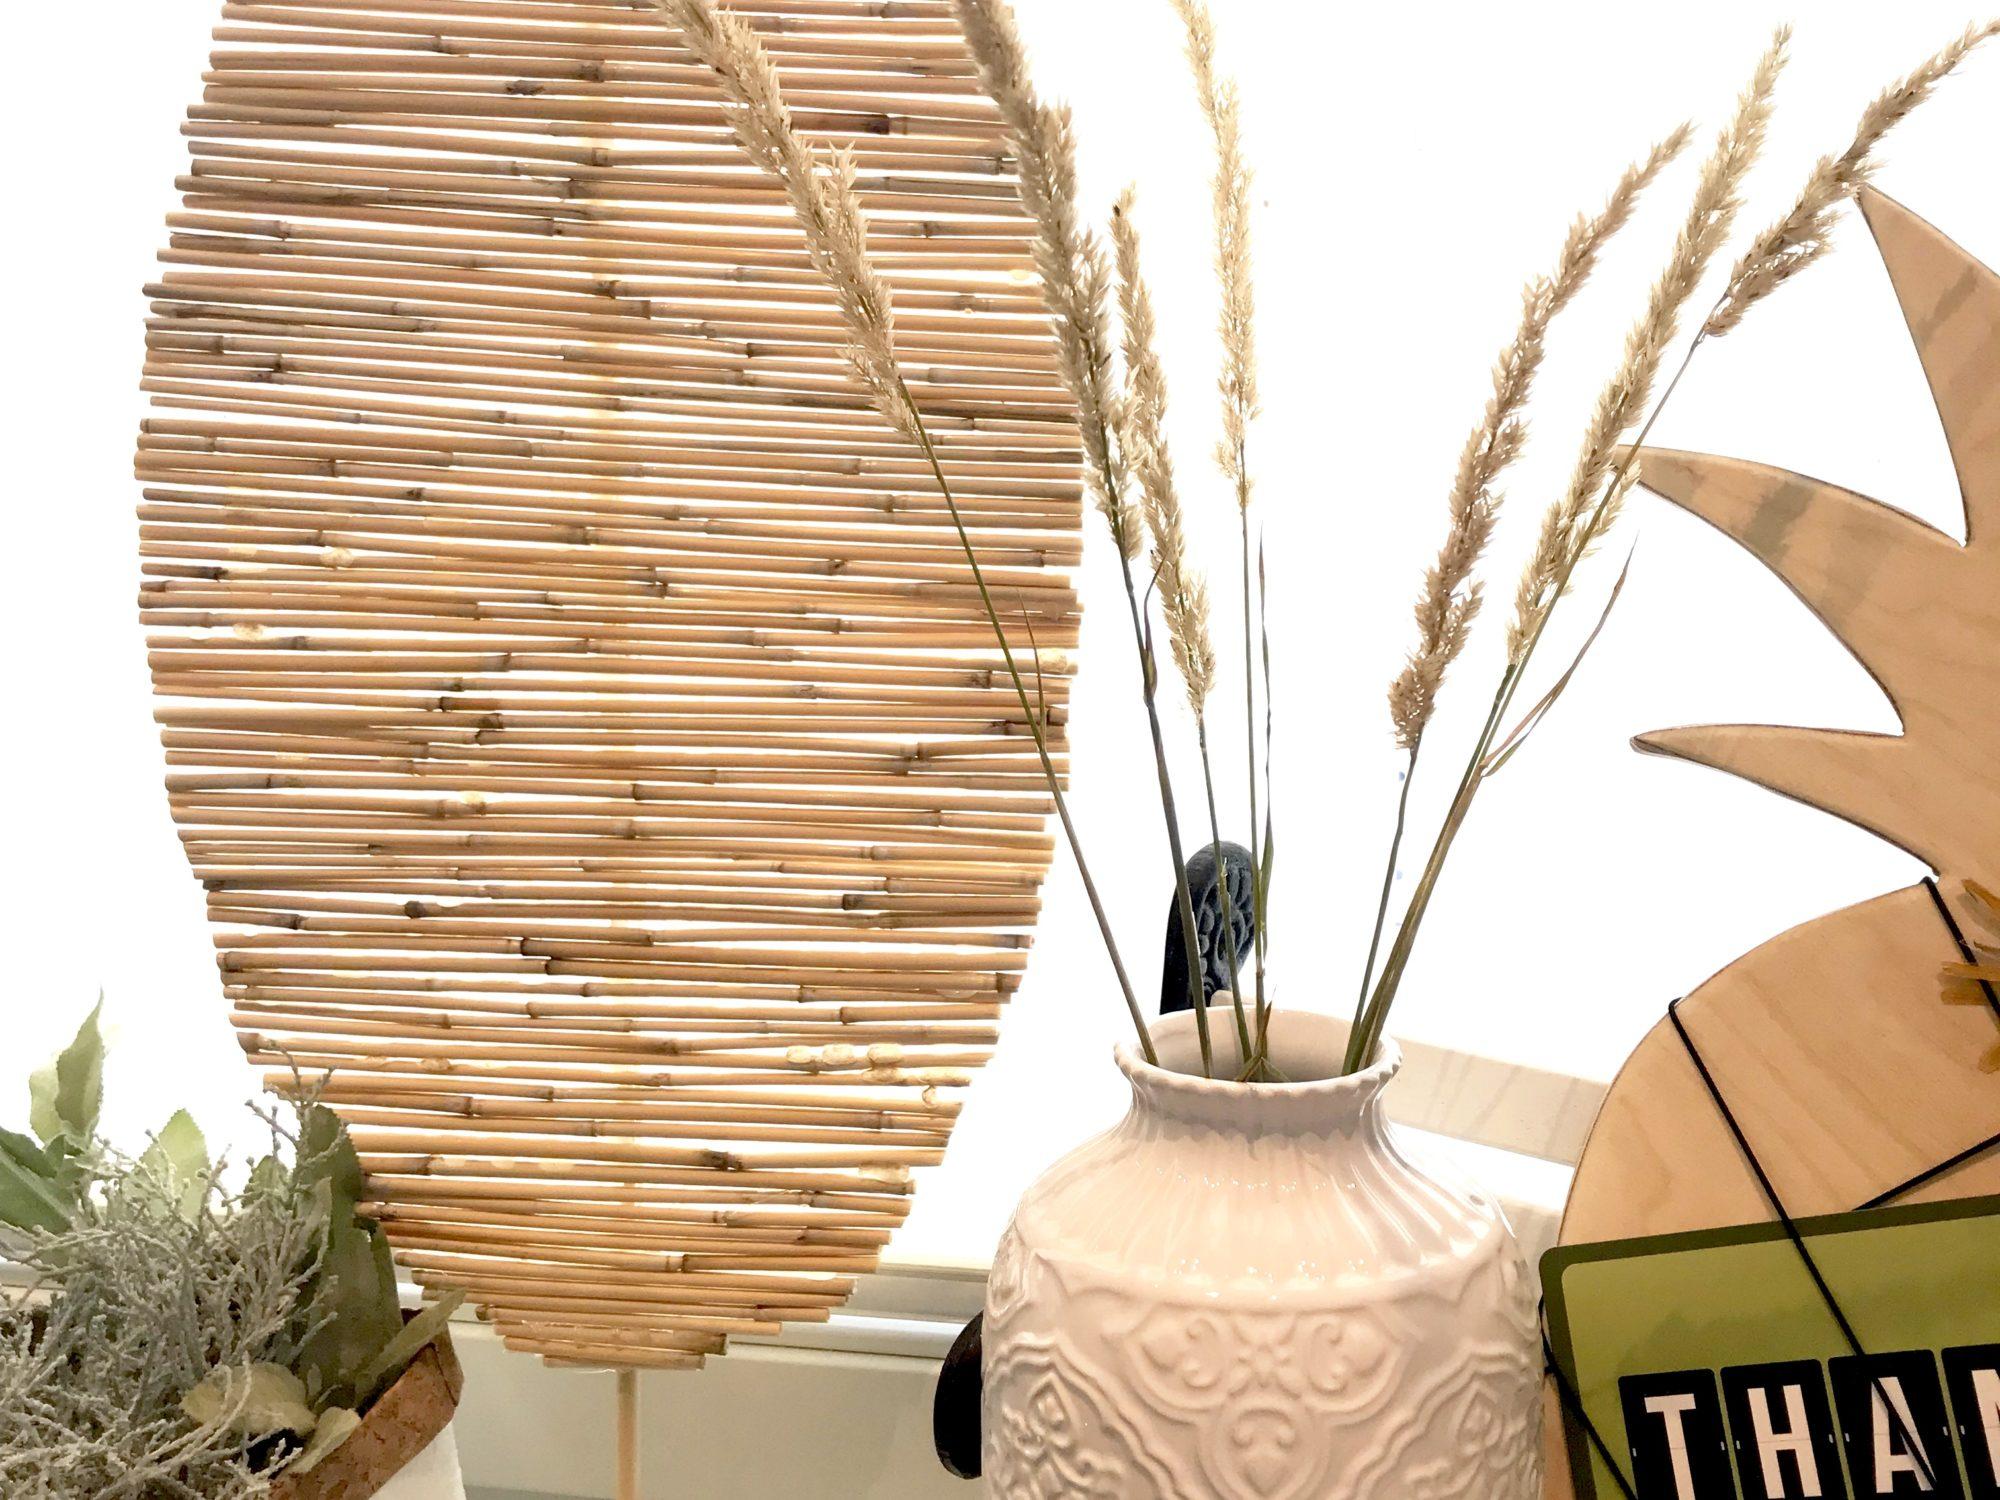 Bambusdeko. Bambusblatt. Dekoblatt aus Bambus basteln. Basteln mit Naturmaterialien. #Chalet8